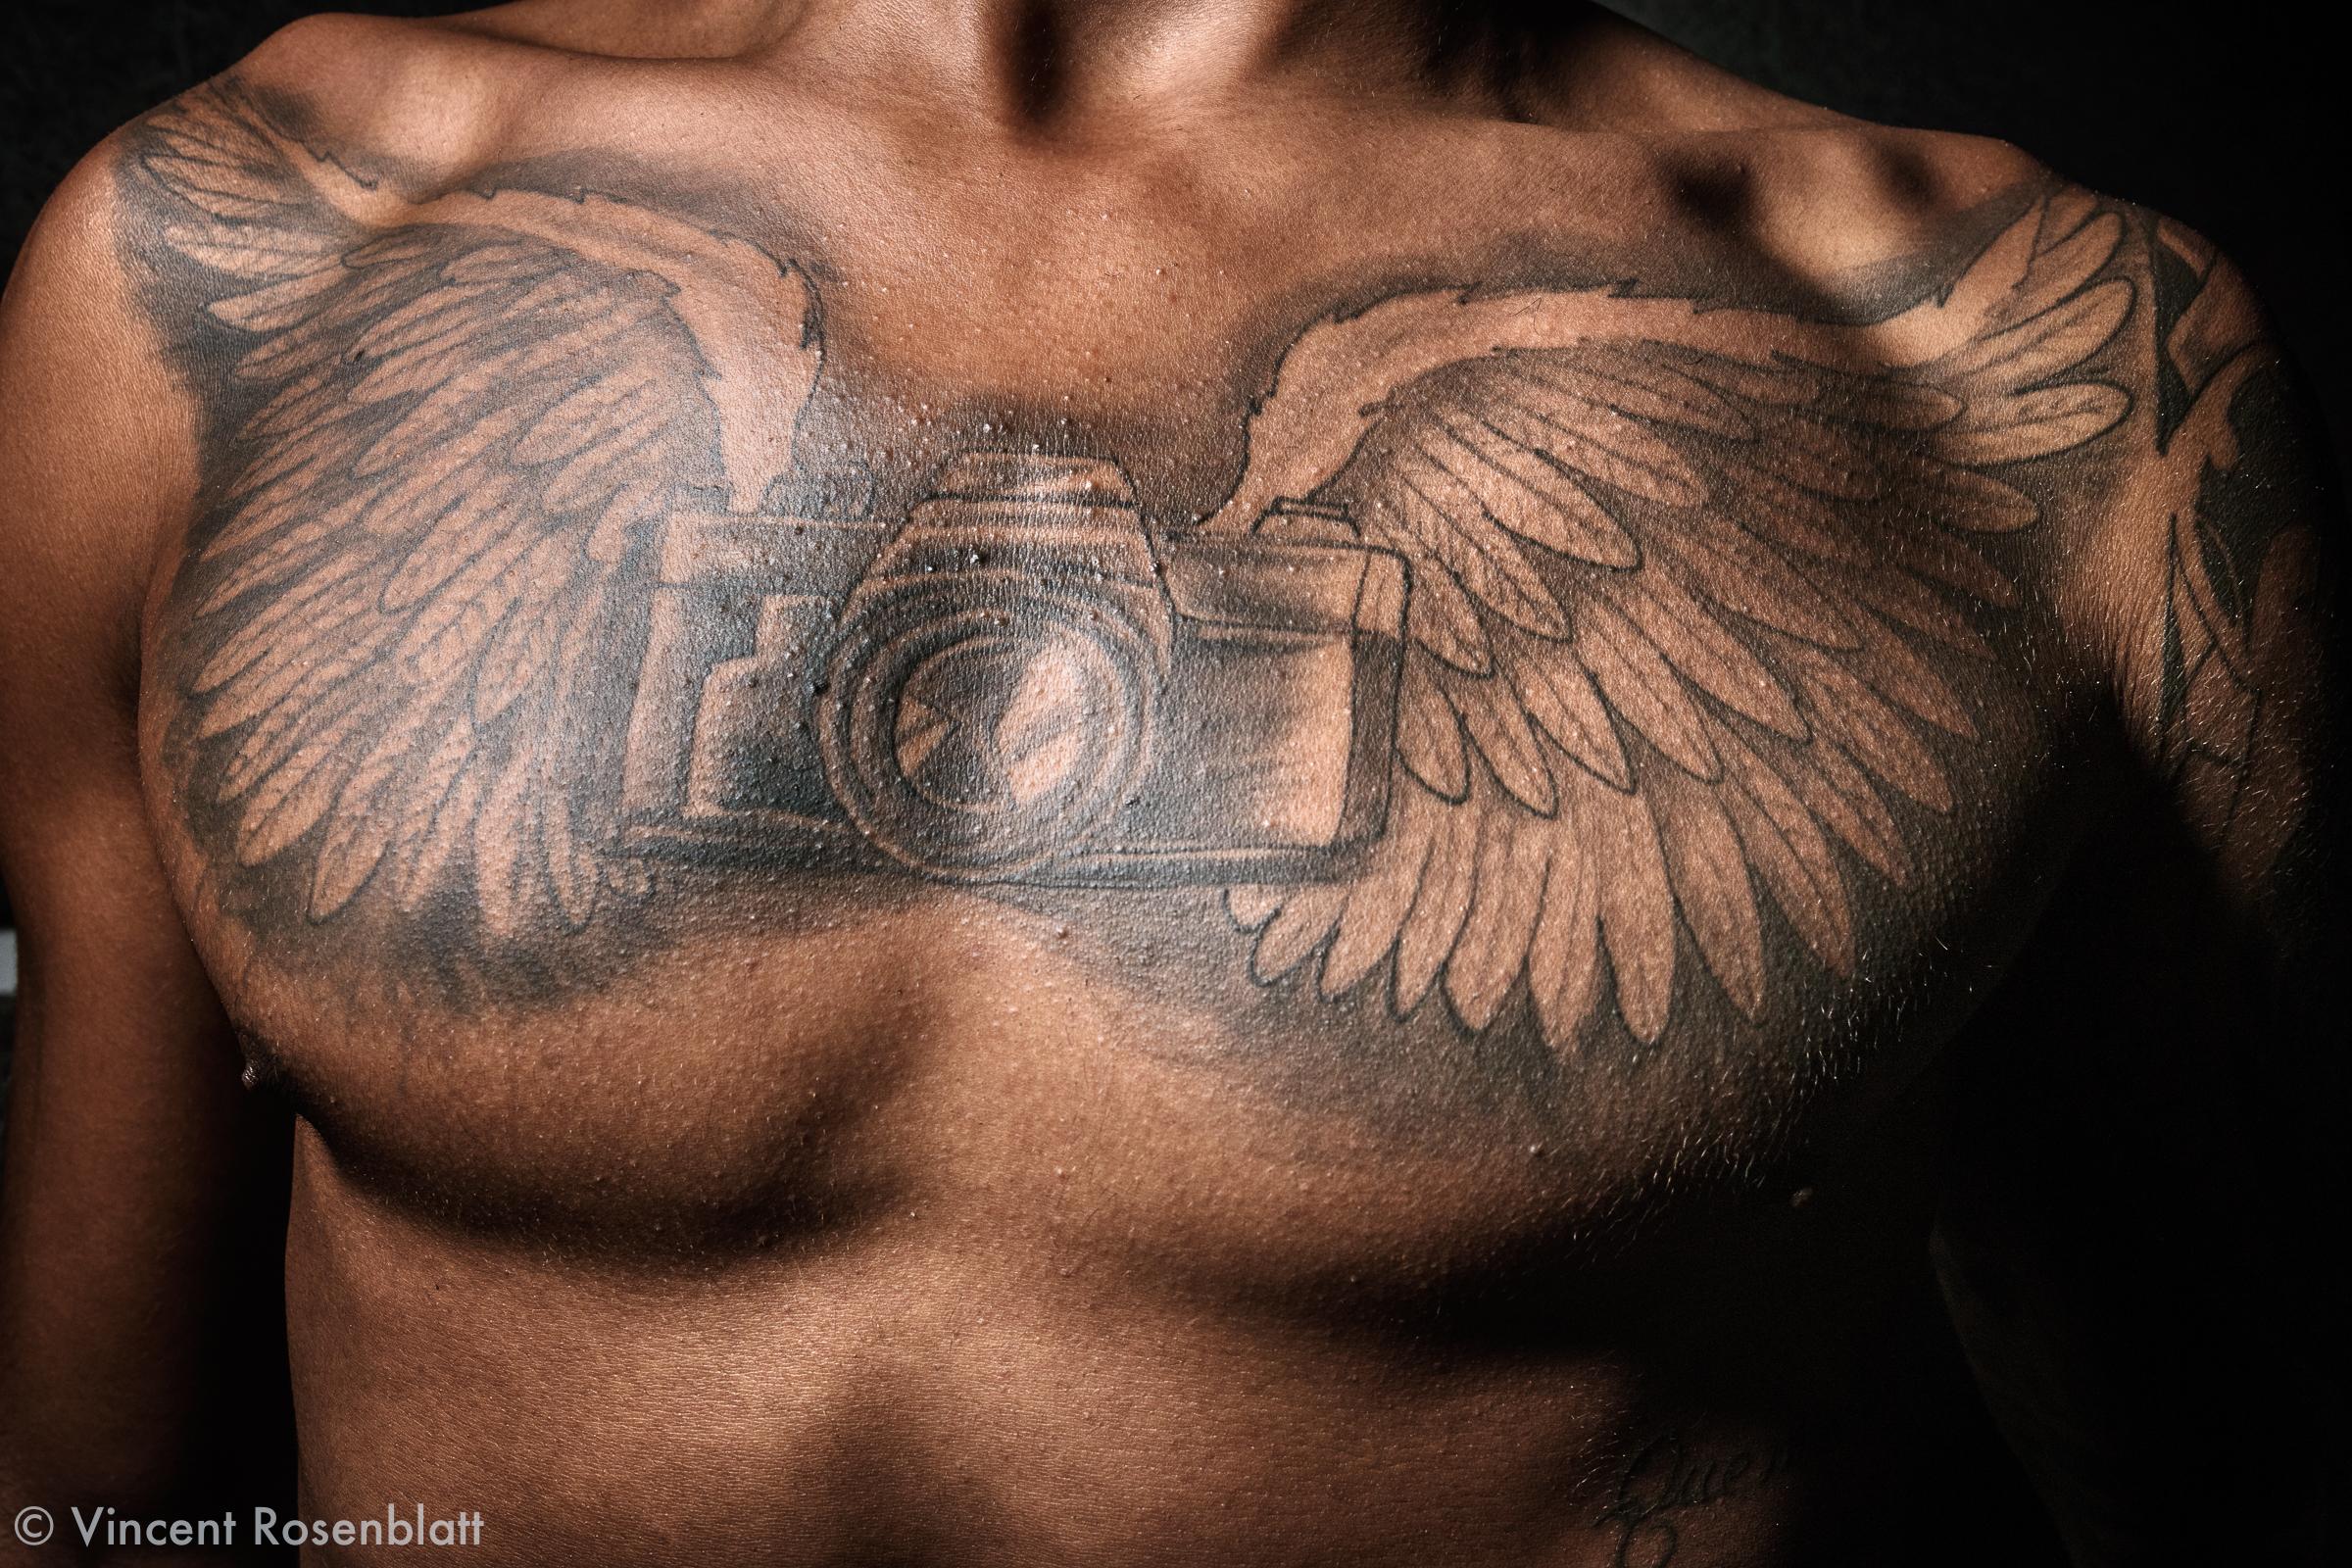 Camera Wings tattoo, Yolo Love Party, Bento Ribeiro, Rio de Janeiro 2018.